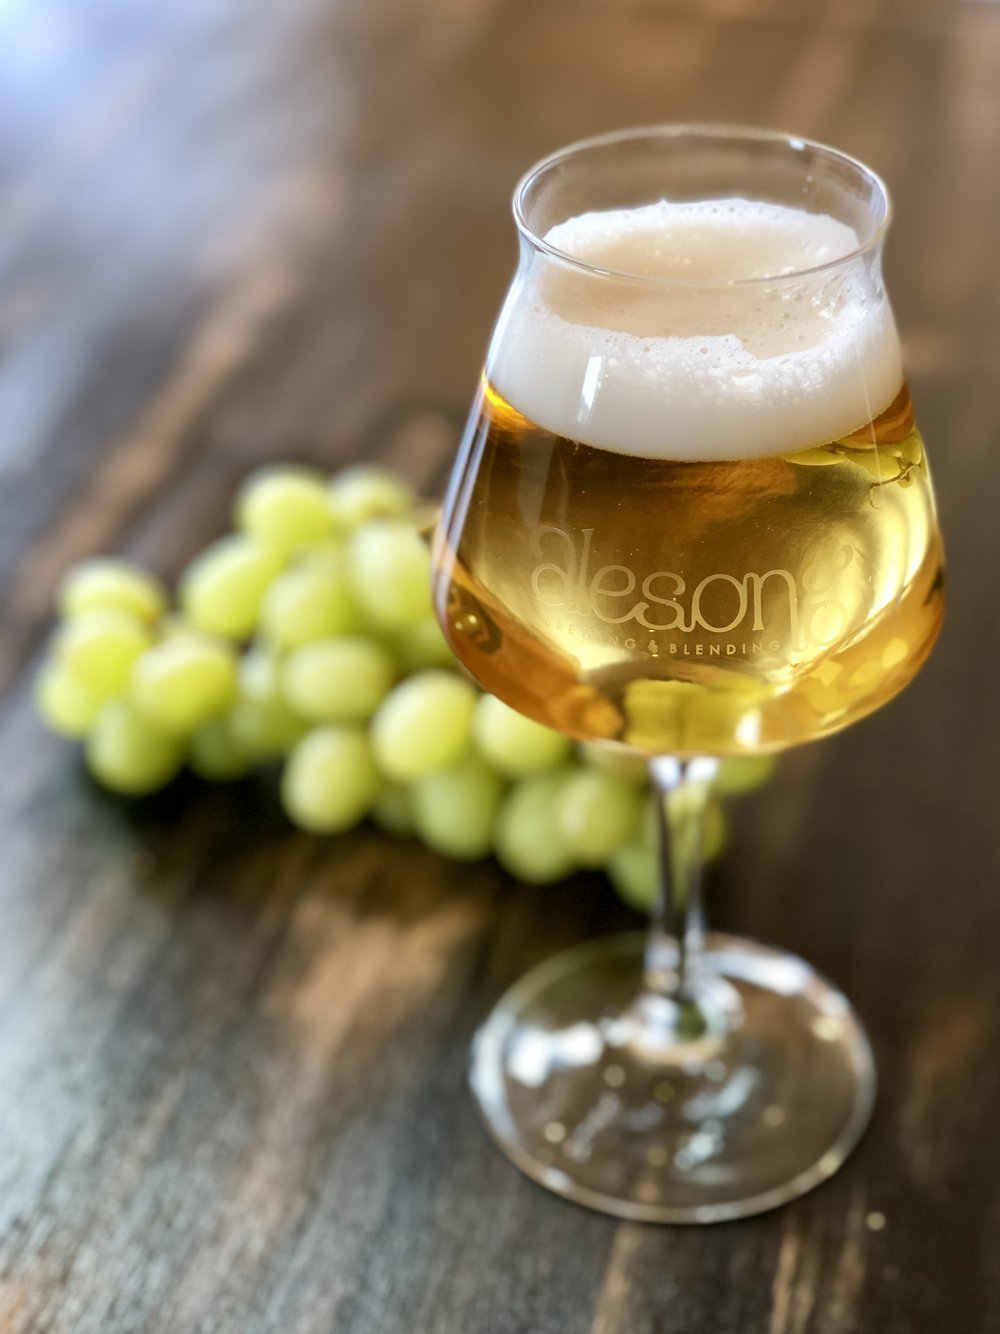 Terroir: Chardonnay